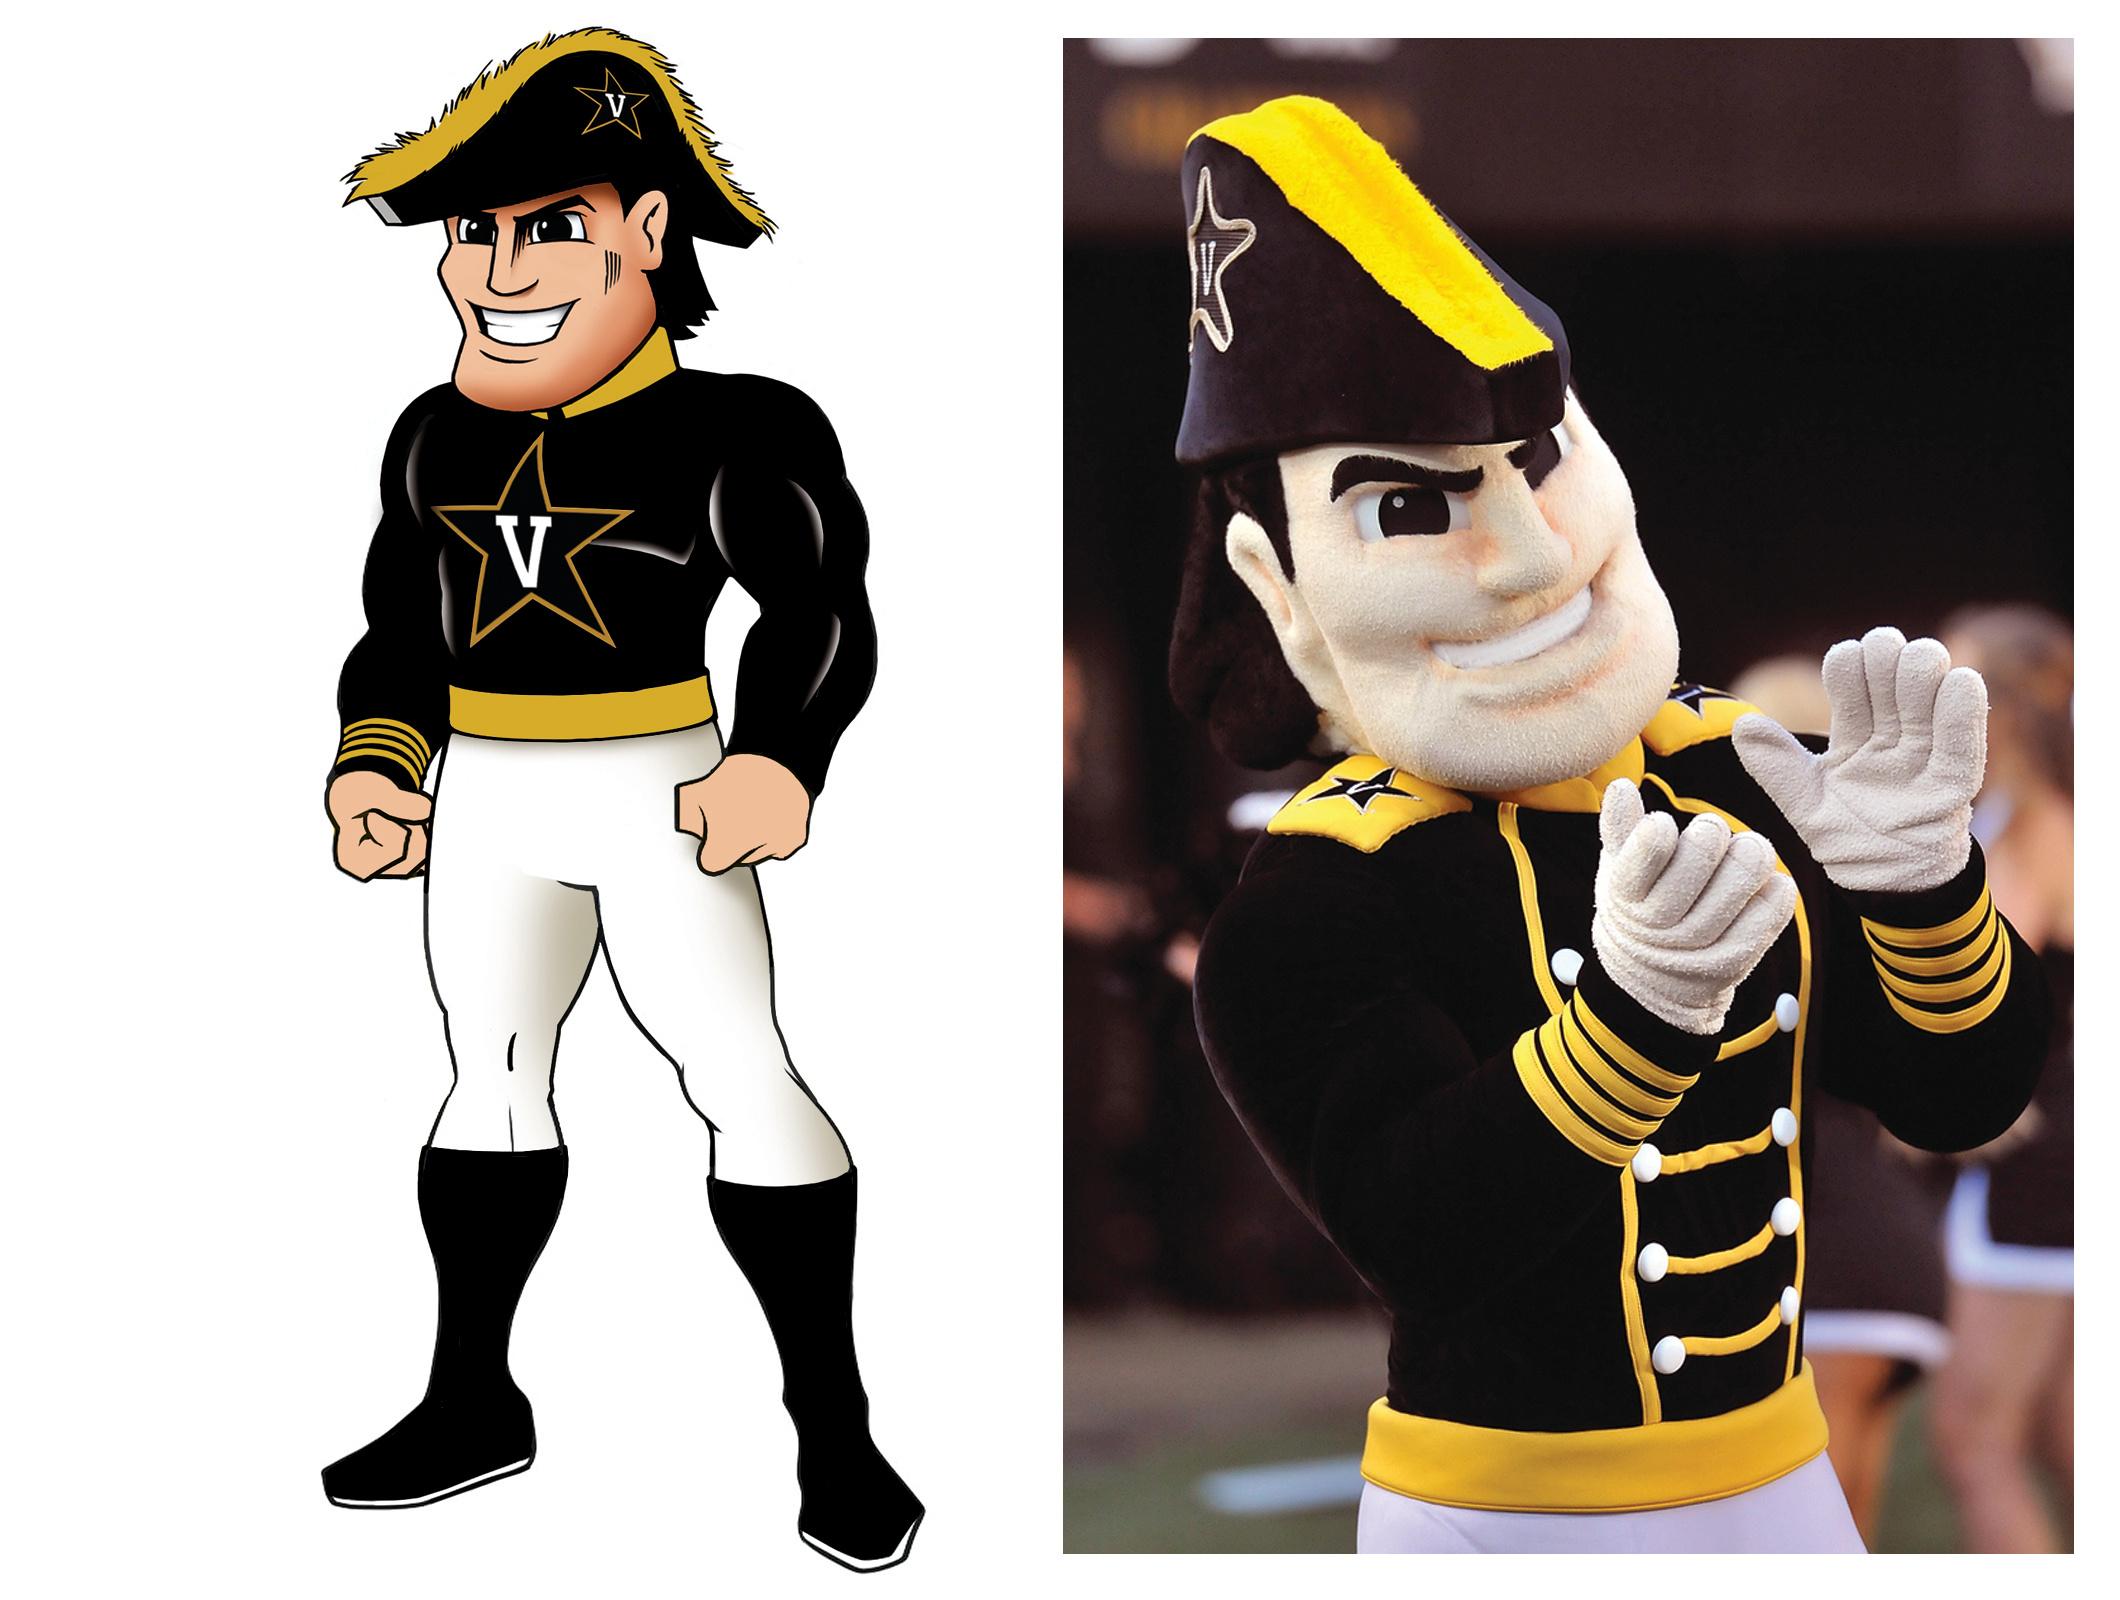 Mr. C - Vanderbilt University